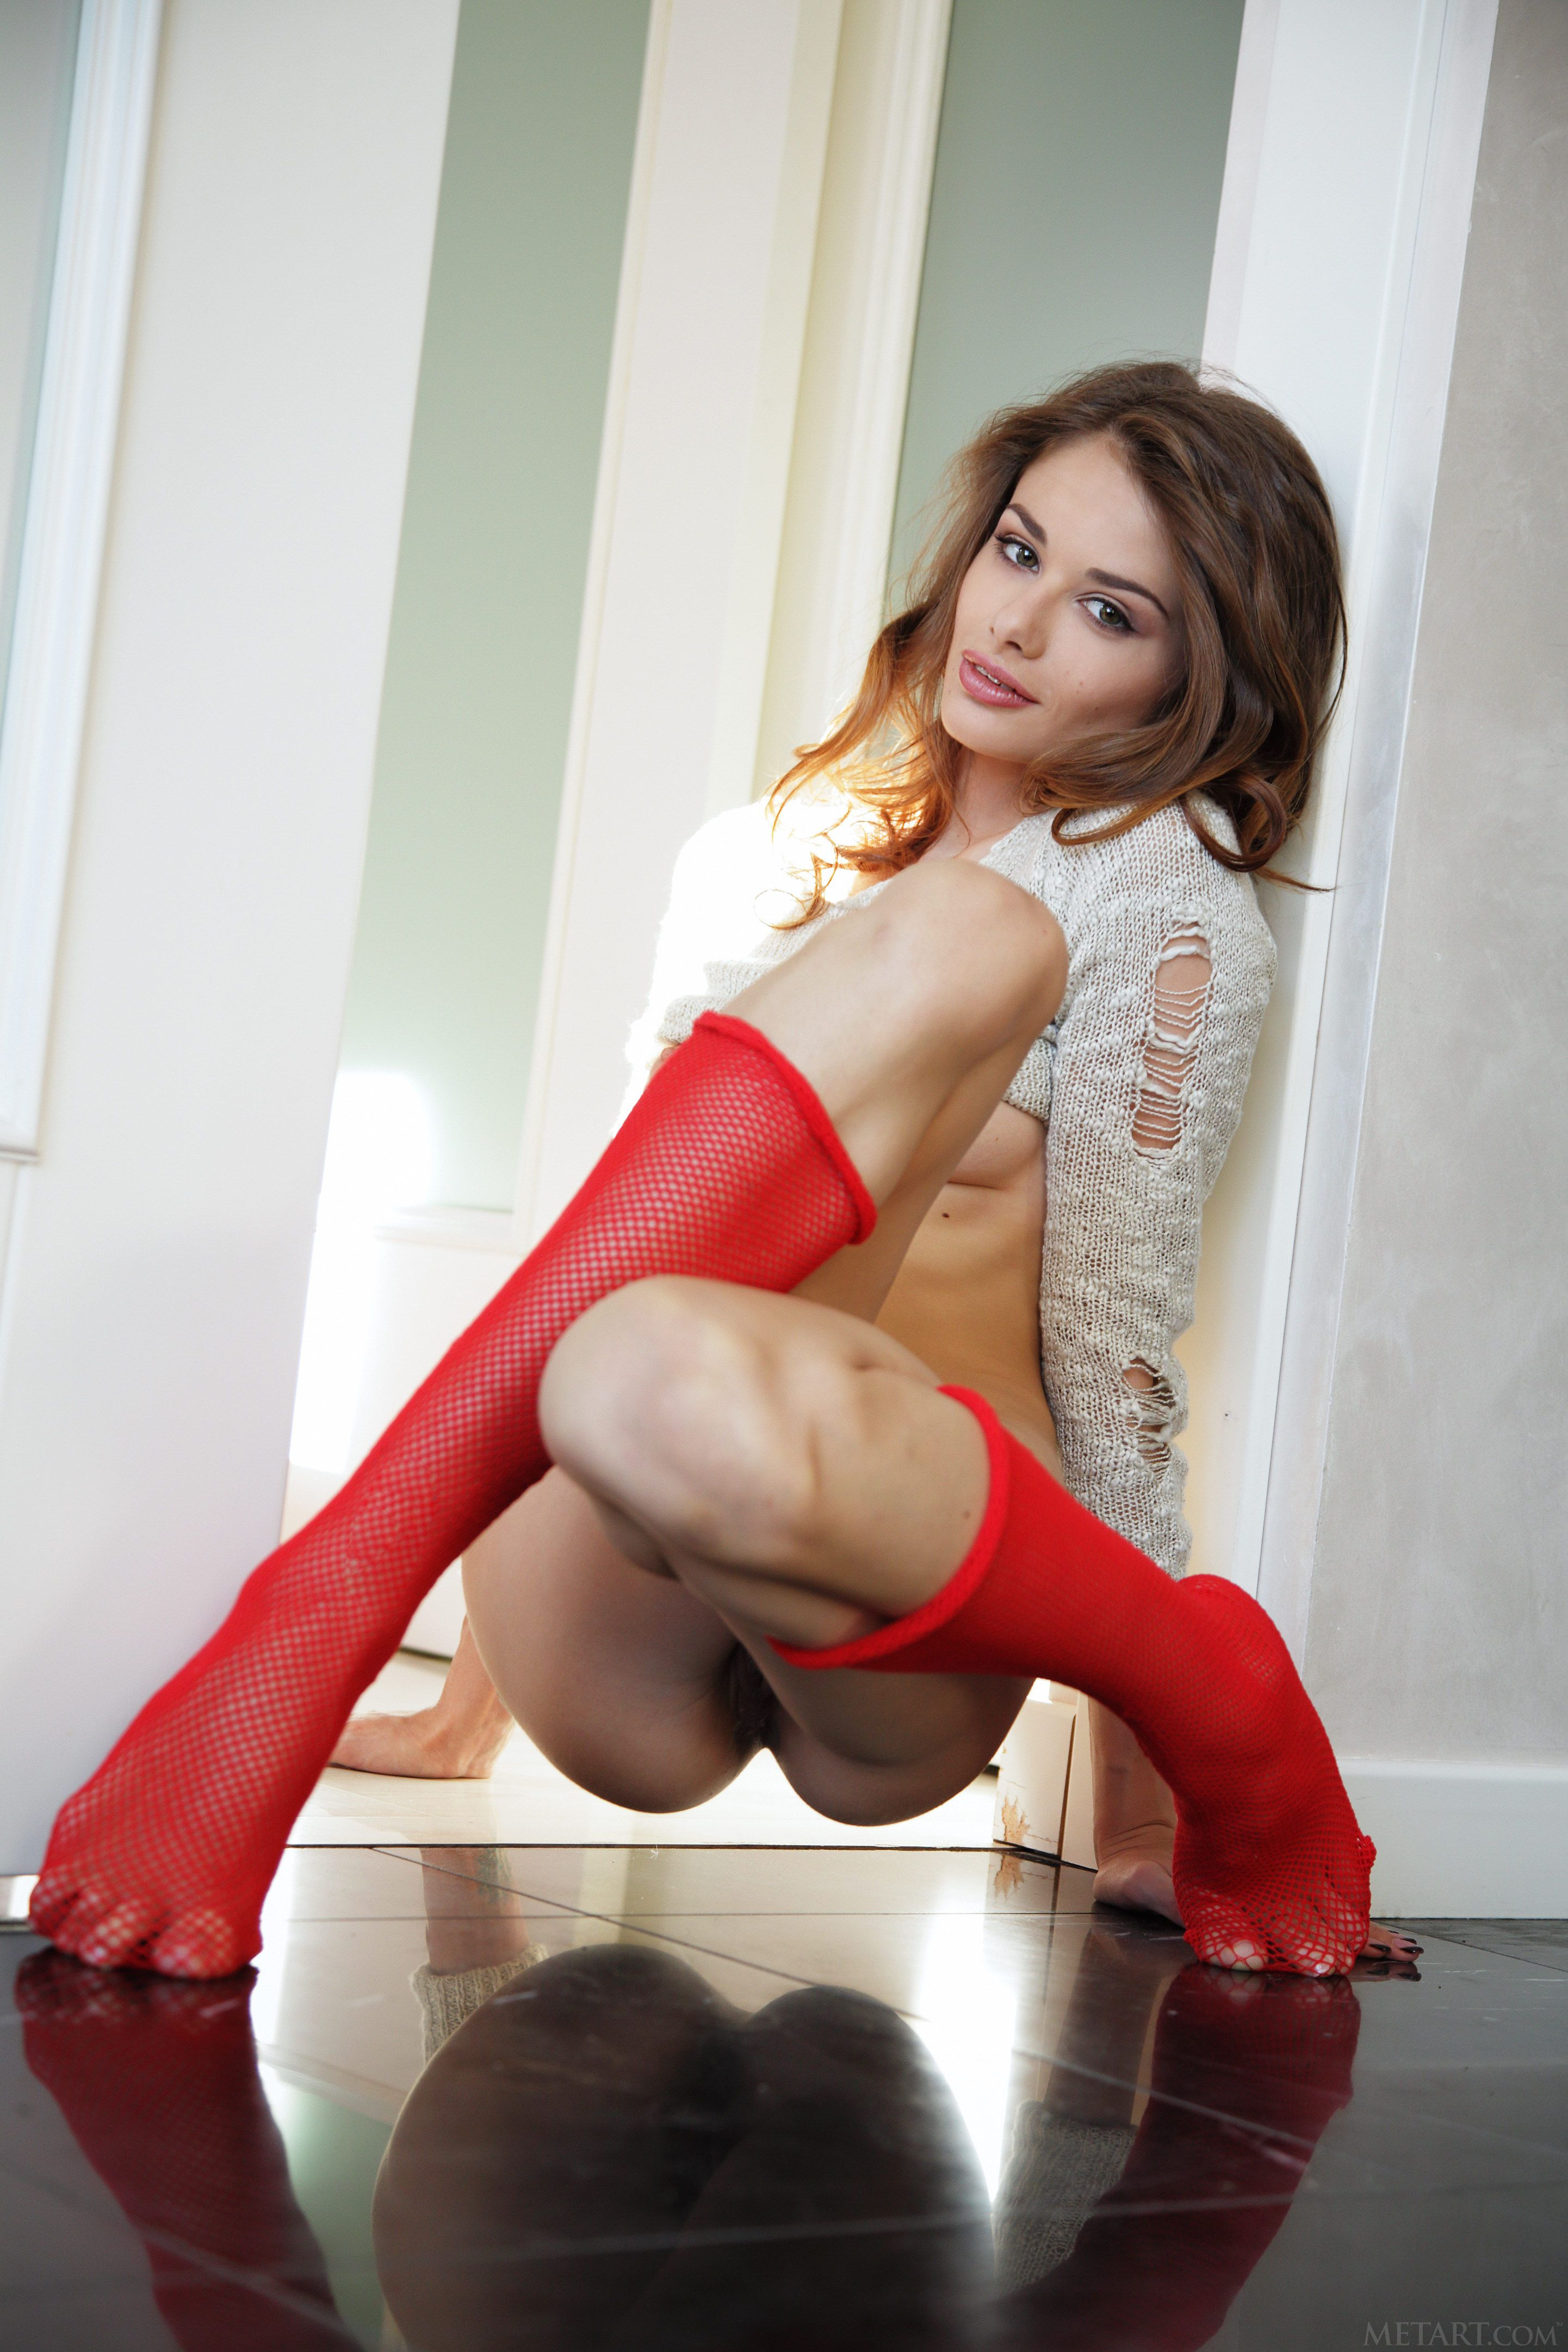 http://i3.imageban.ru/out/2014/02/02/cae1d74245f5b807103ae4543589f87b.jpg